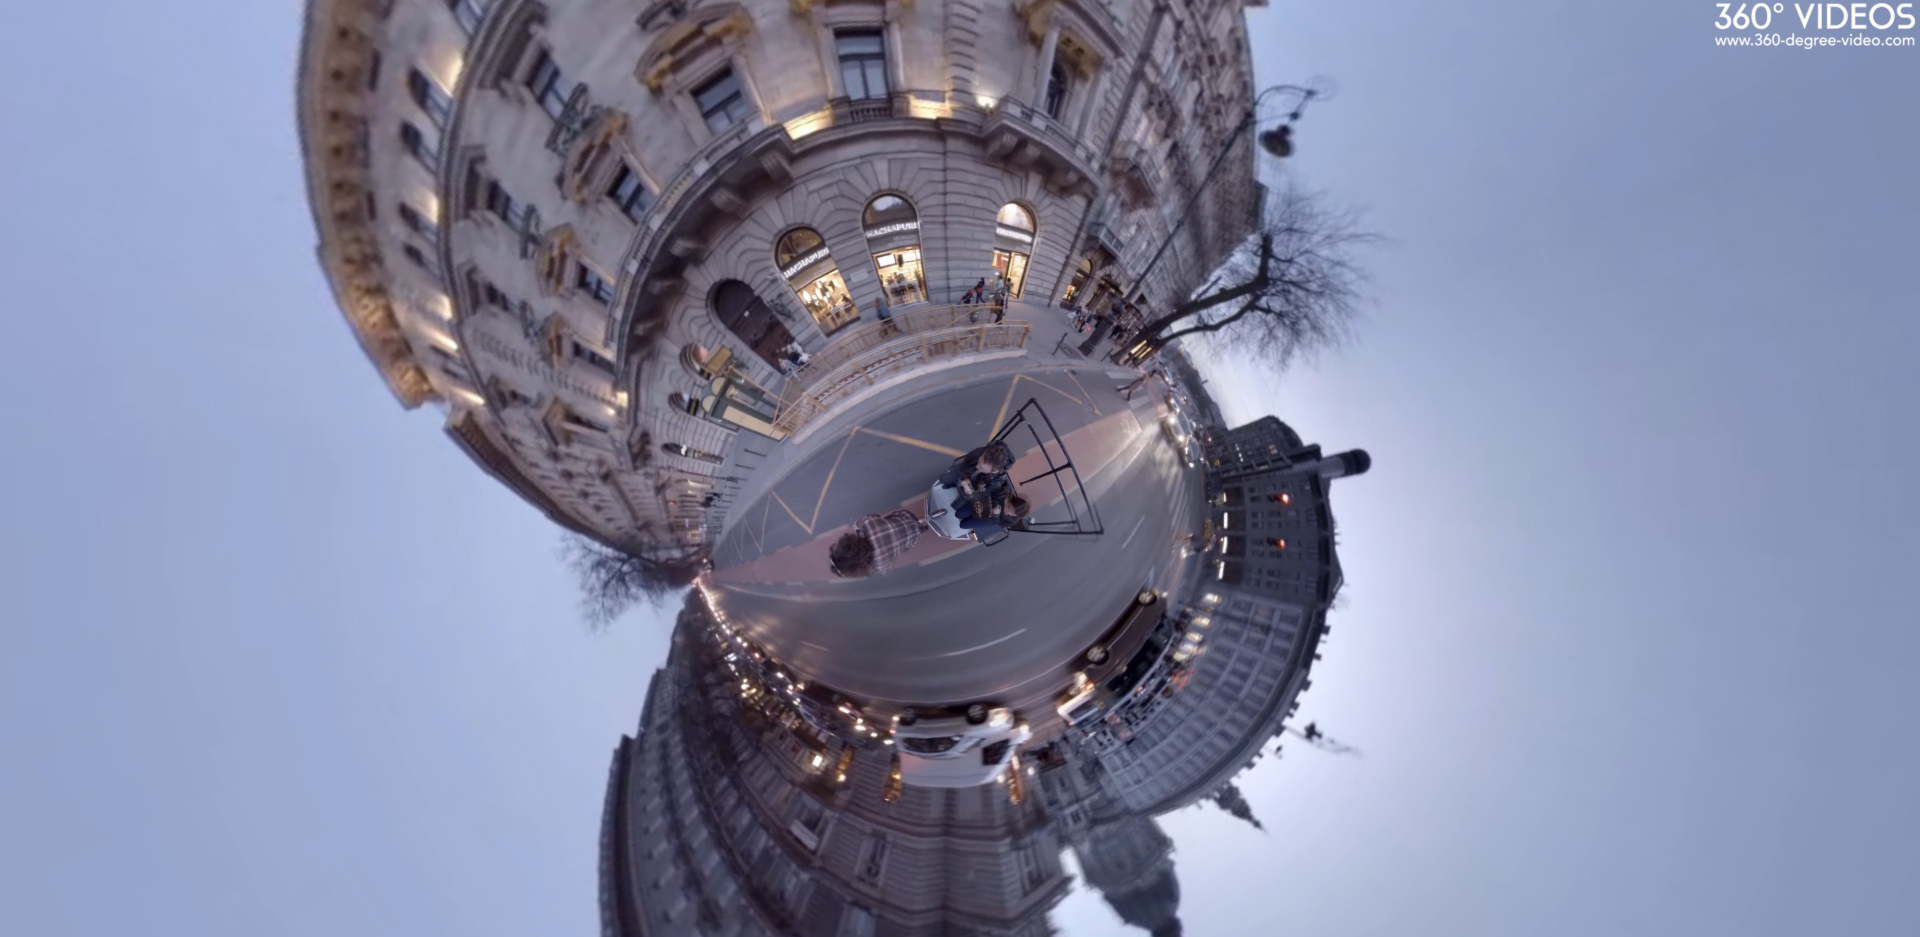 Budapest City 360 degree